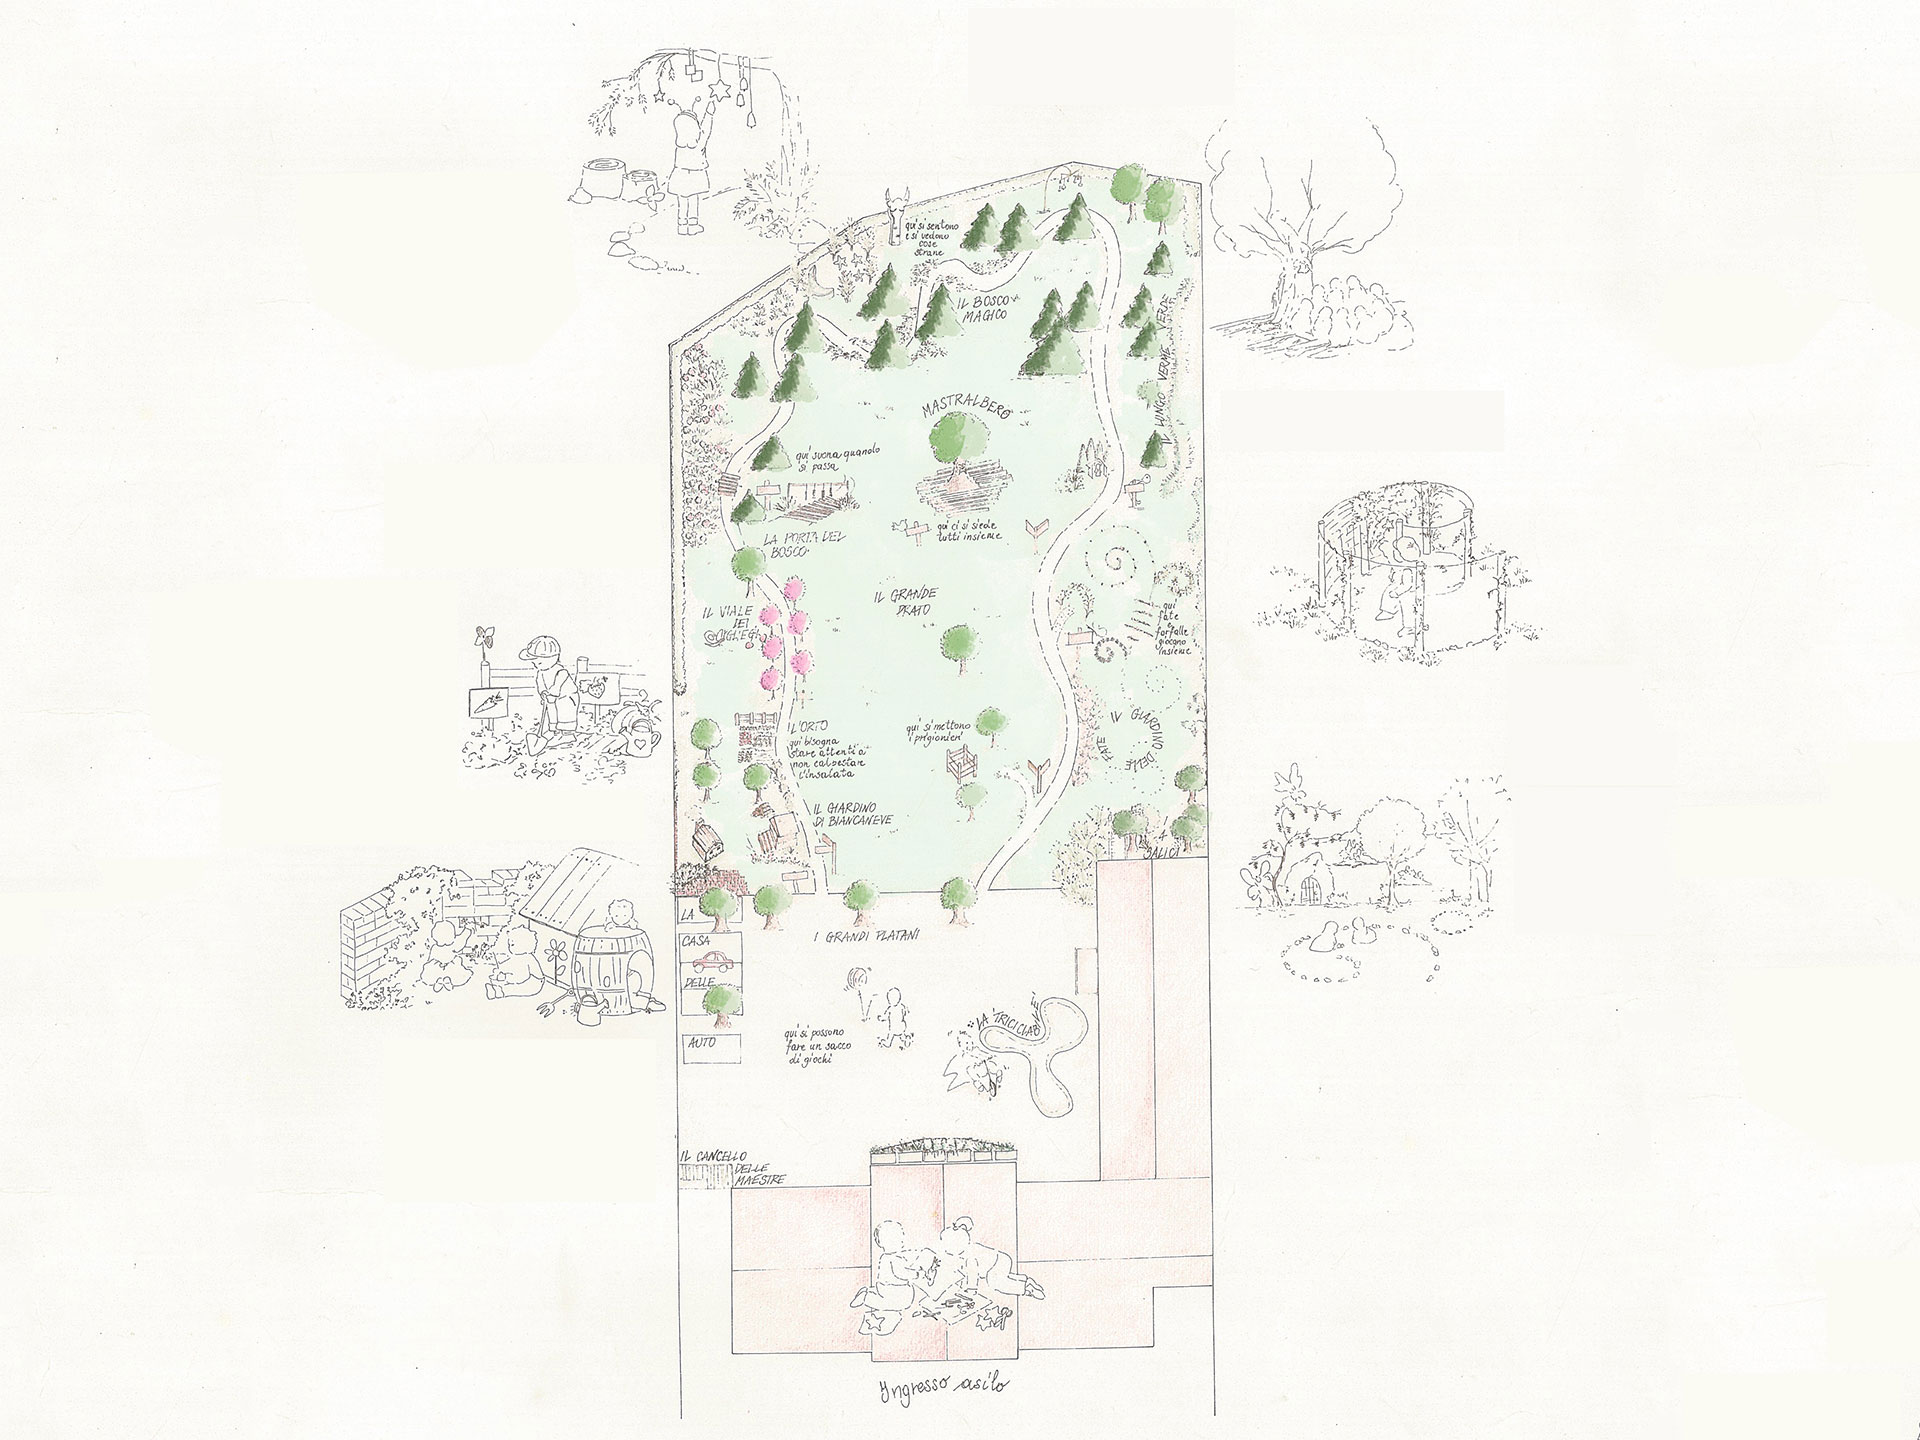 giardino dei bimbi